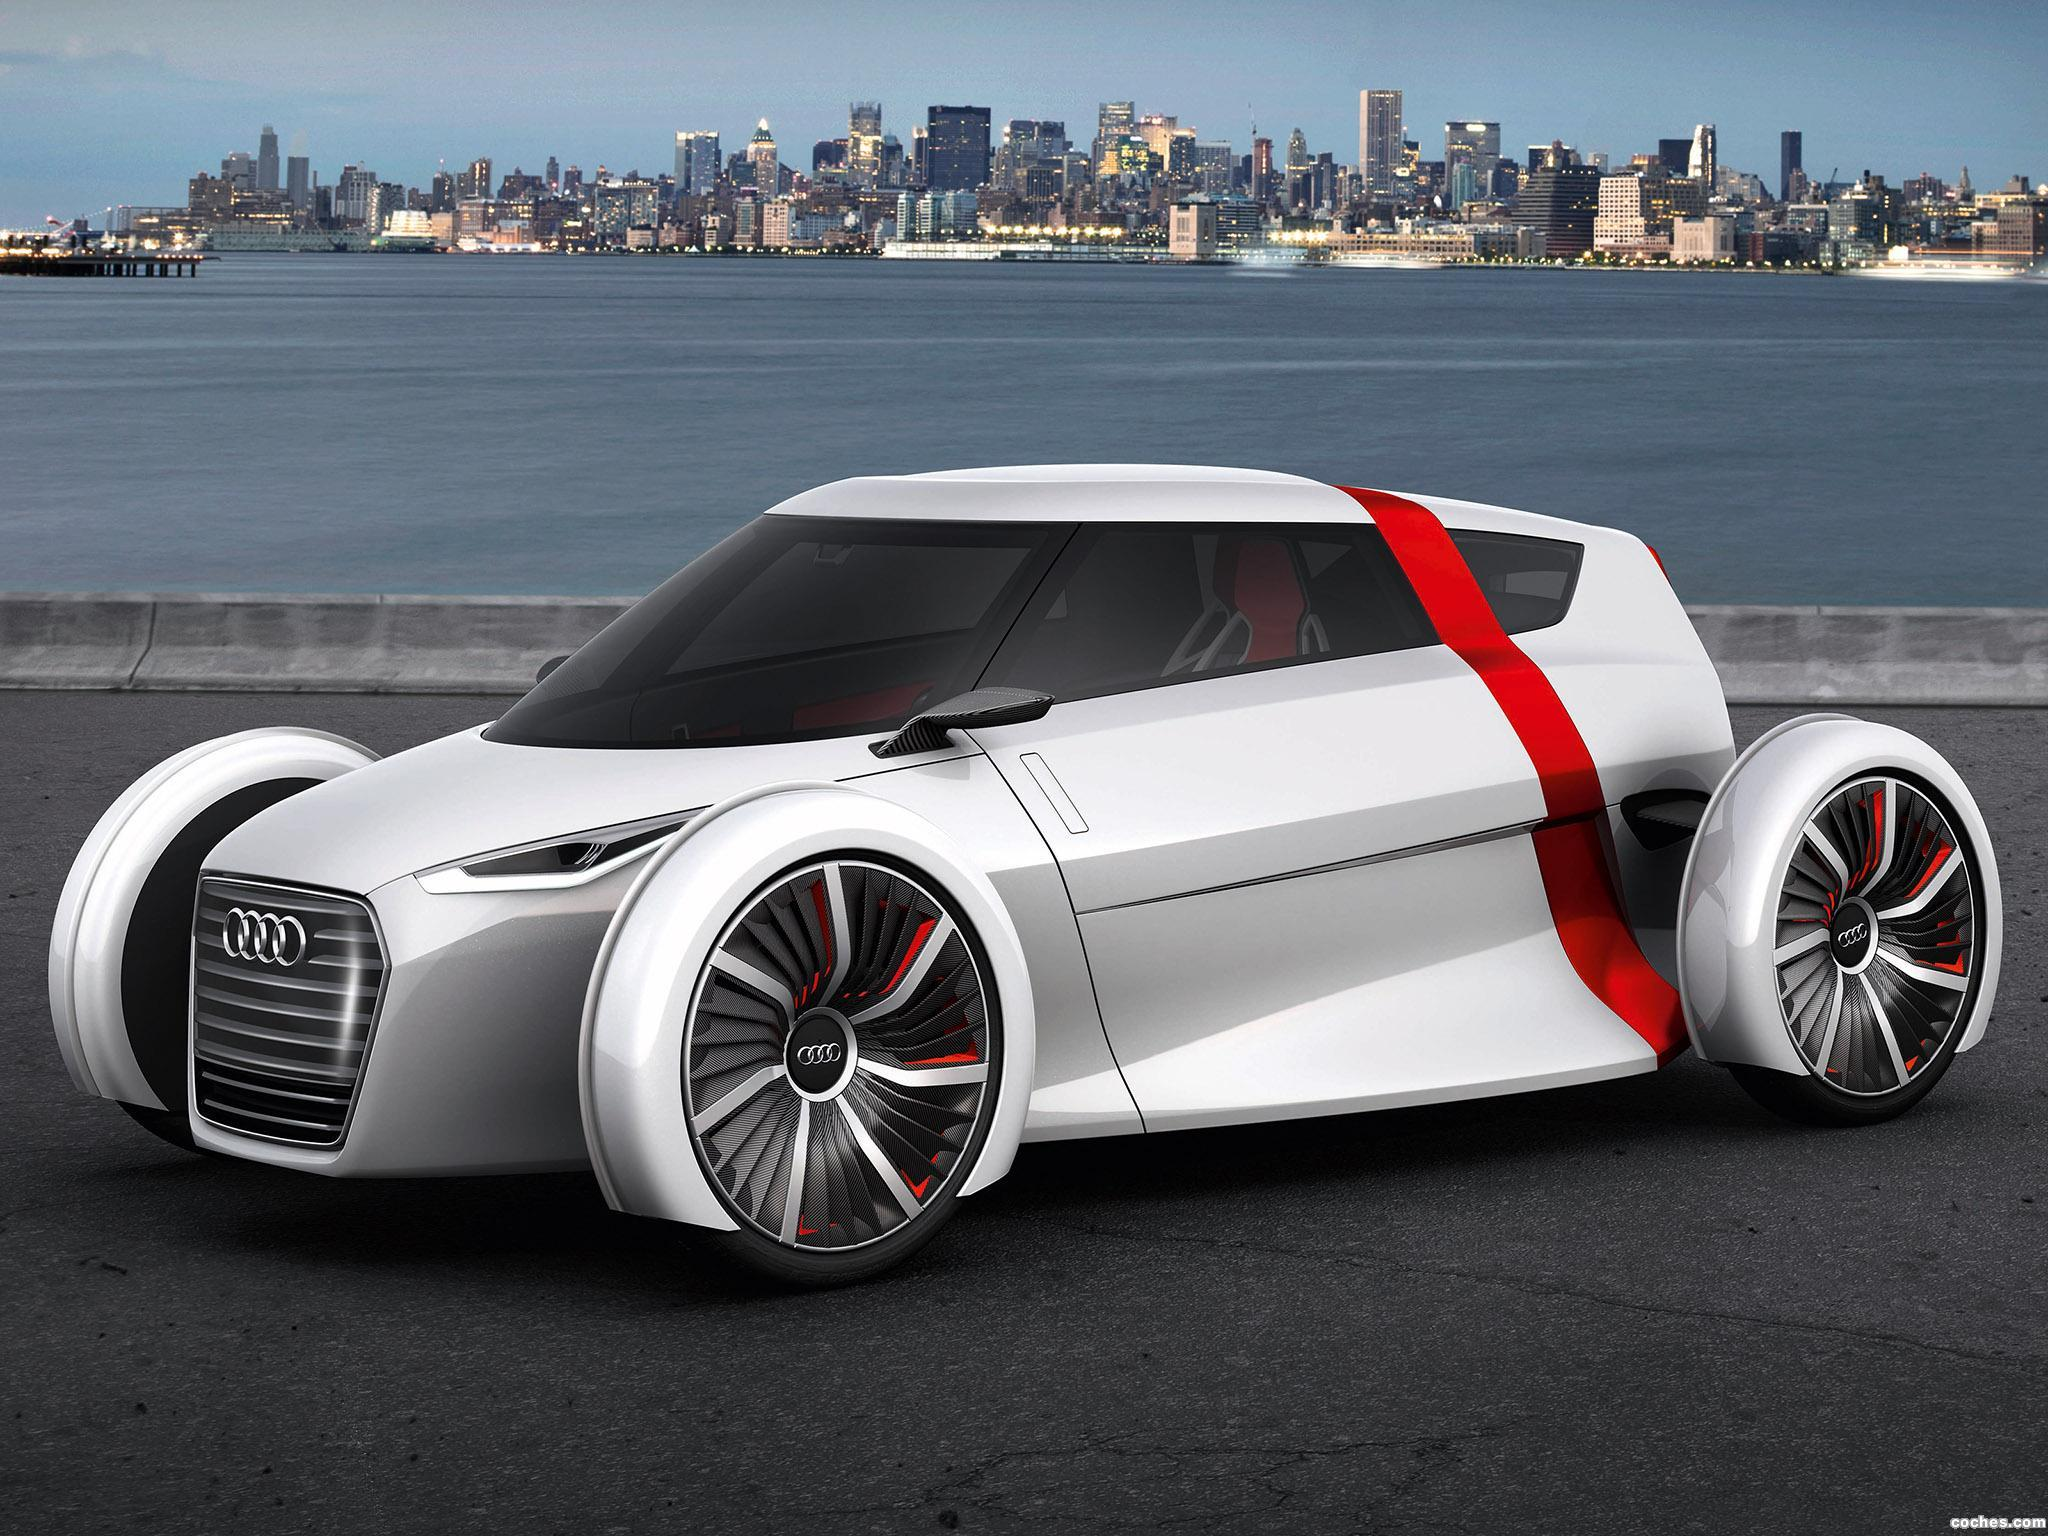 Audi R12 Concept